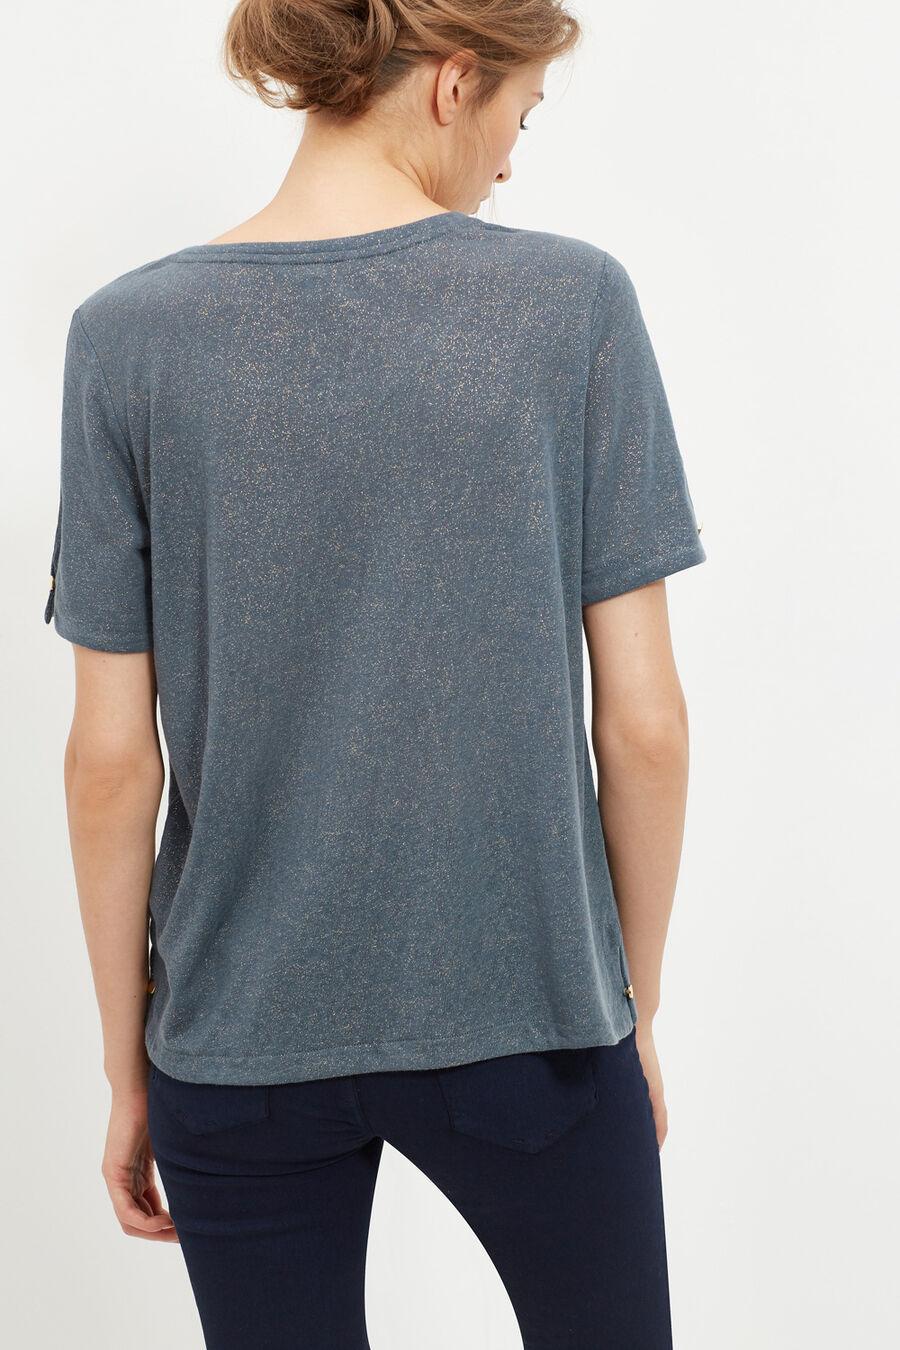 Camiseta en mezcla de lino